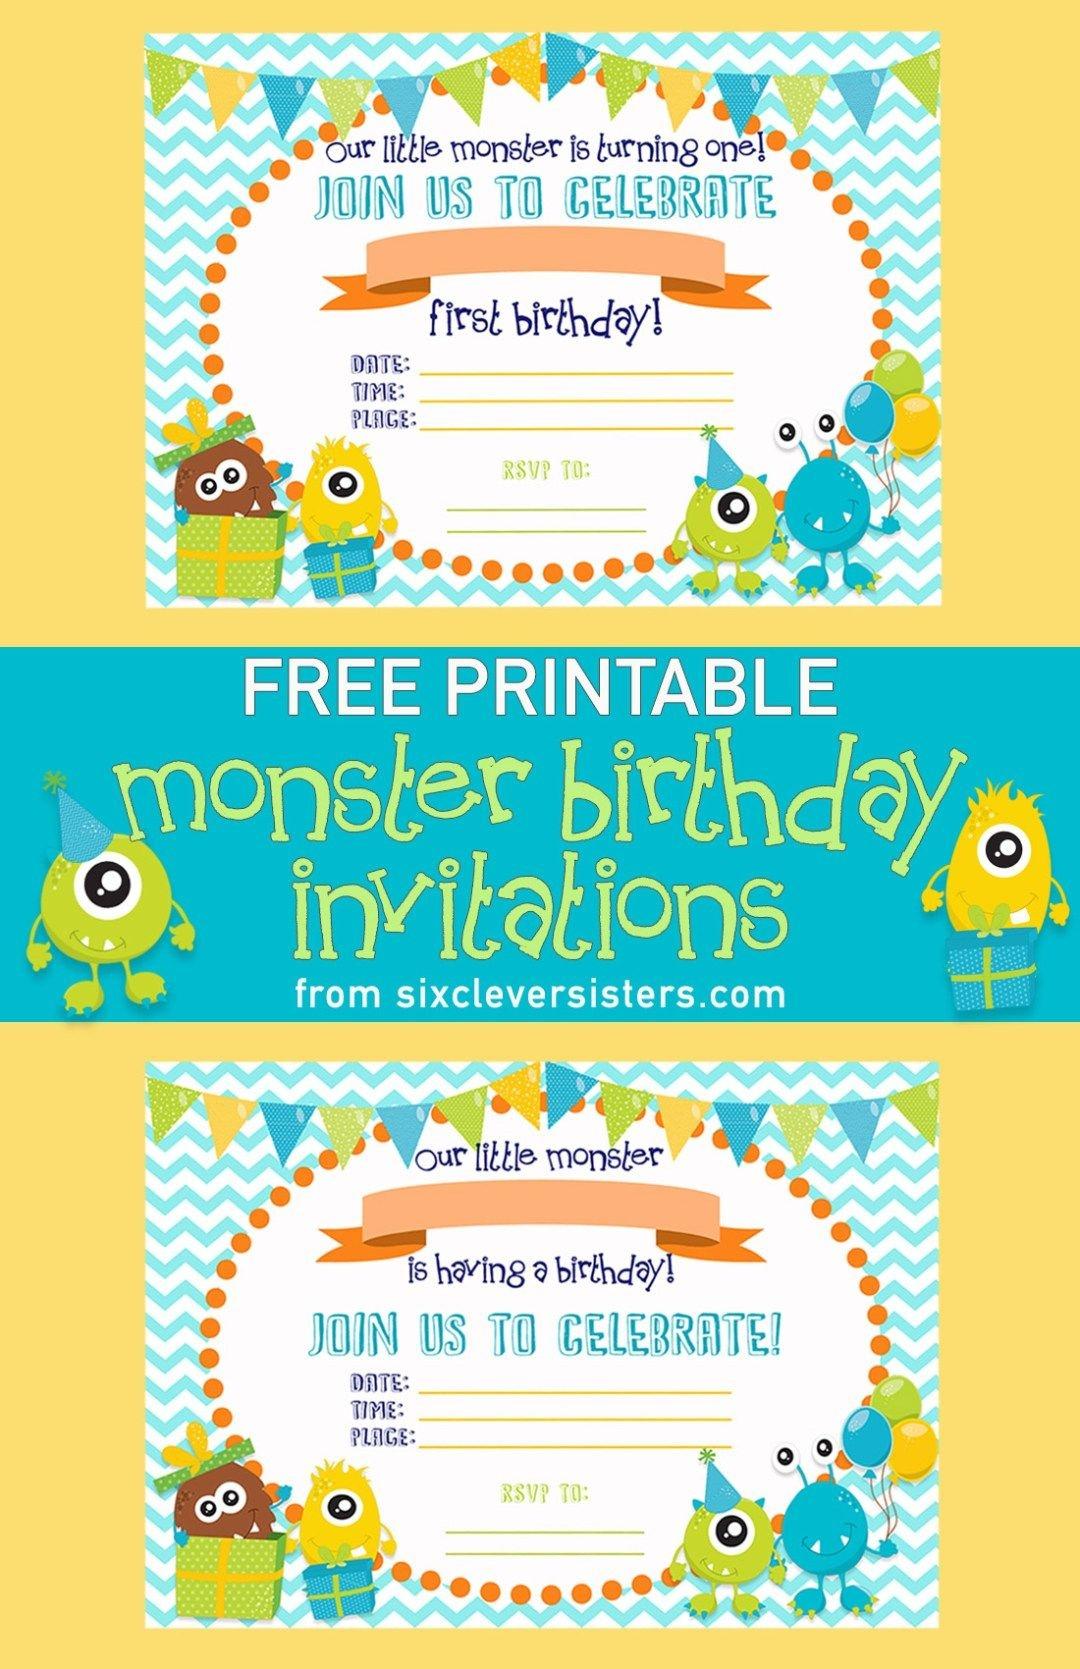 Free Printable Monster Birthday Invitations   Birthday One   Pinterest - Free Printable Birthday Invitations Pinterest